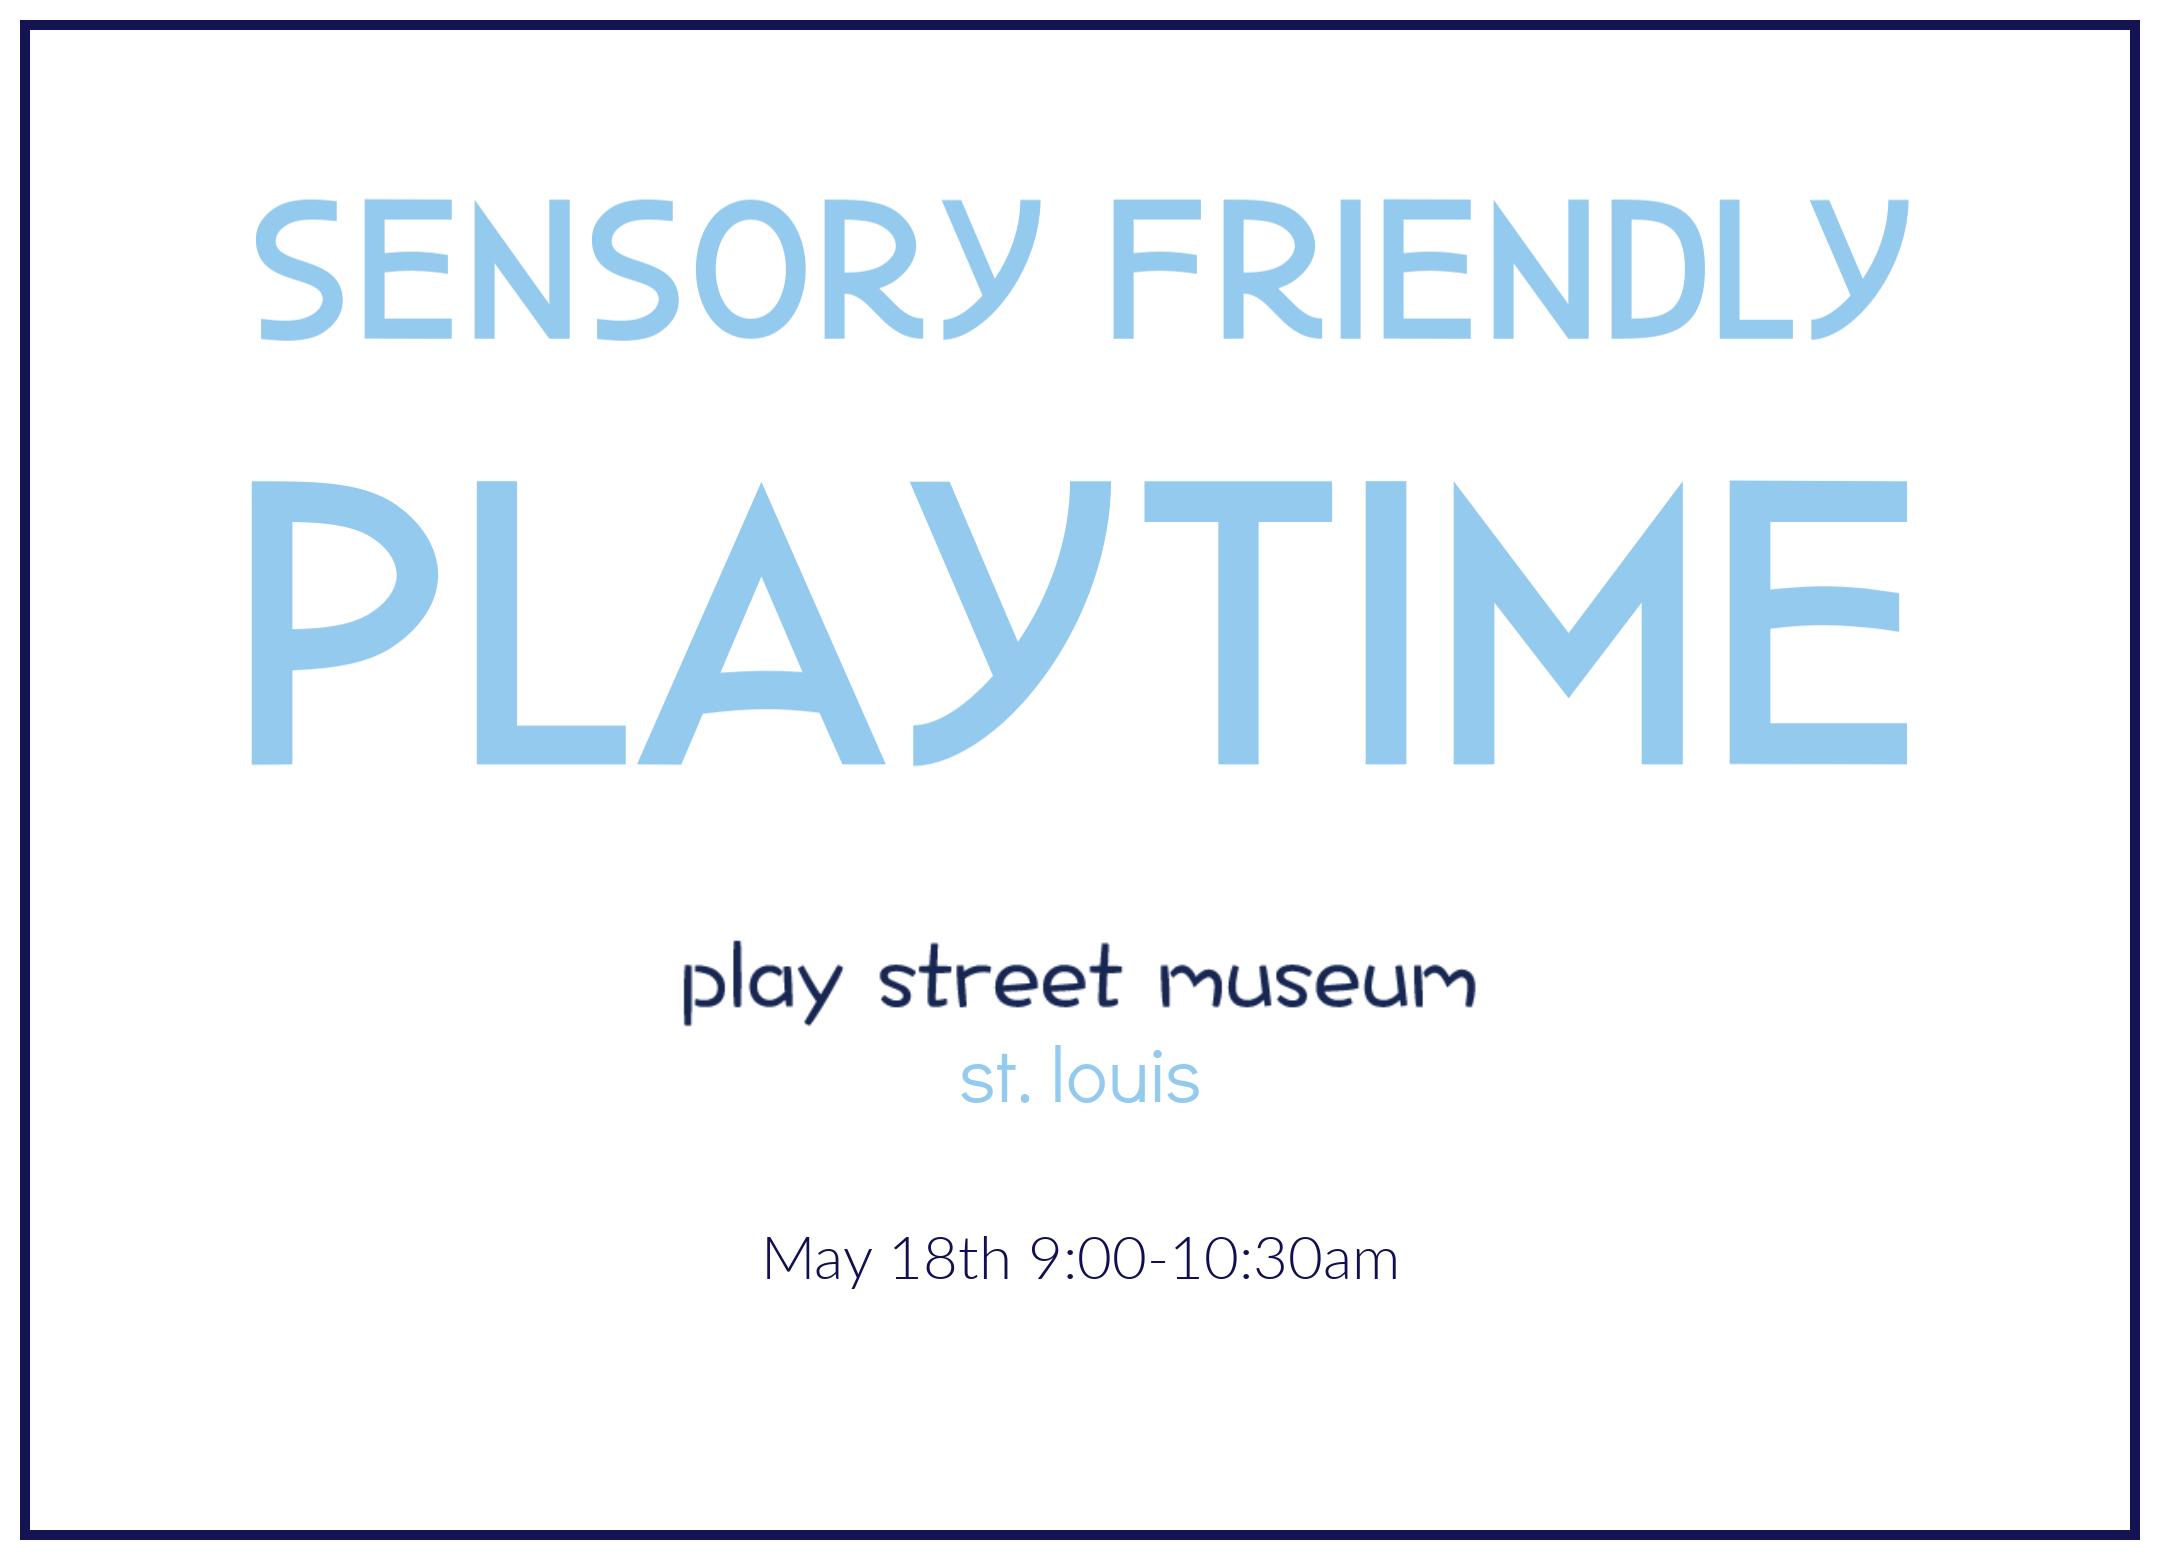 Sensory Friendly Playtime STL.png